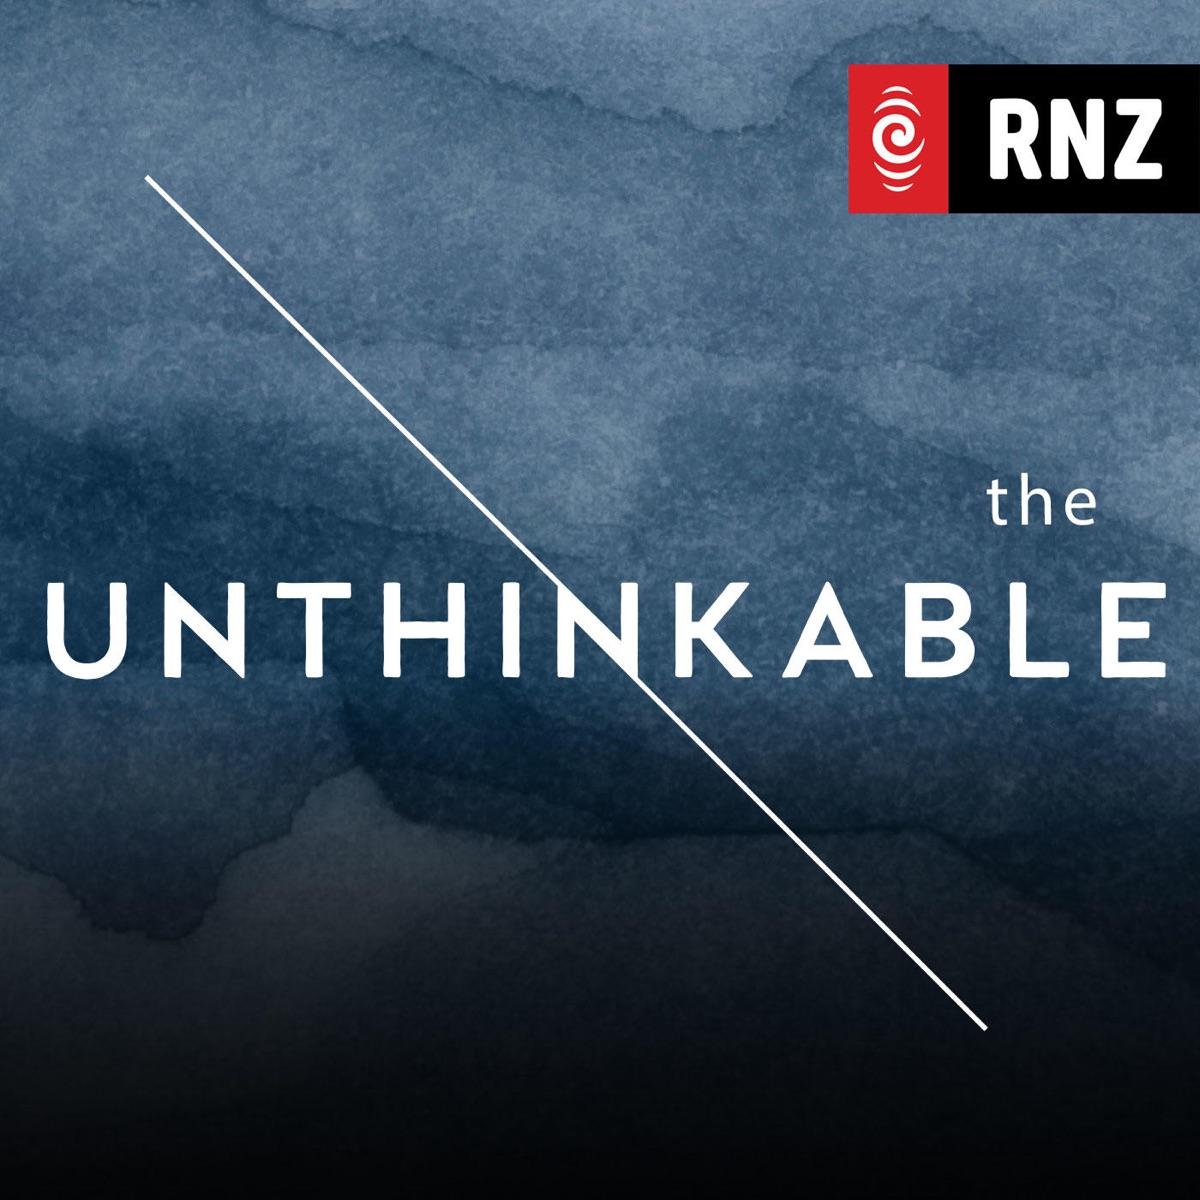 RNZ: The Unthinkable